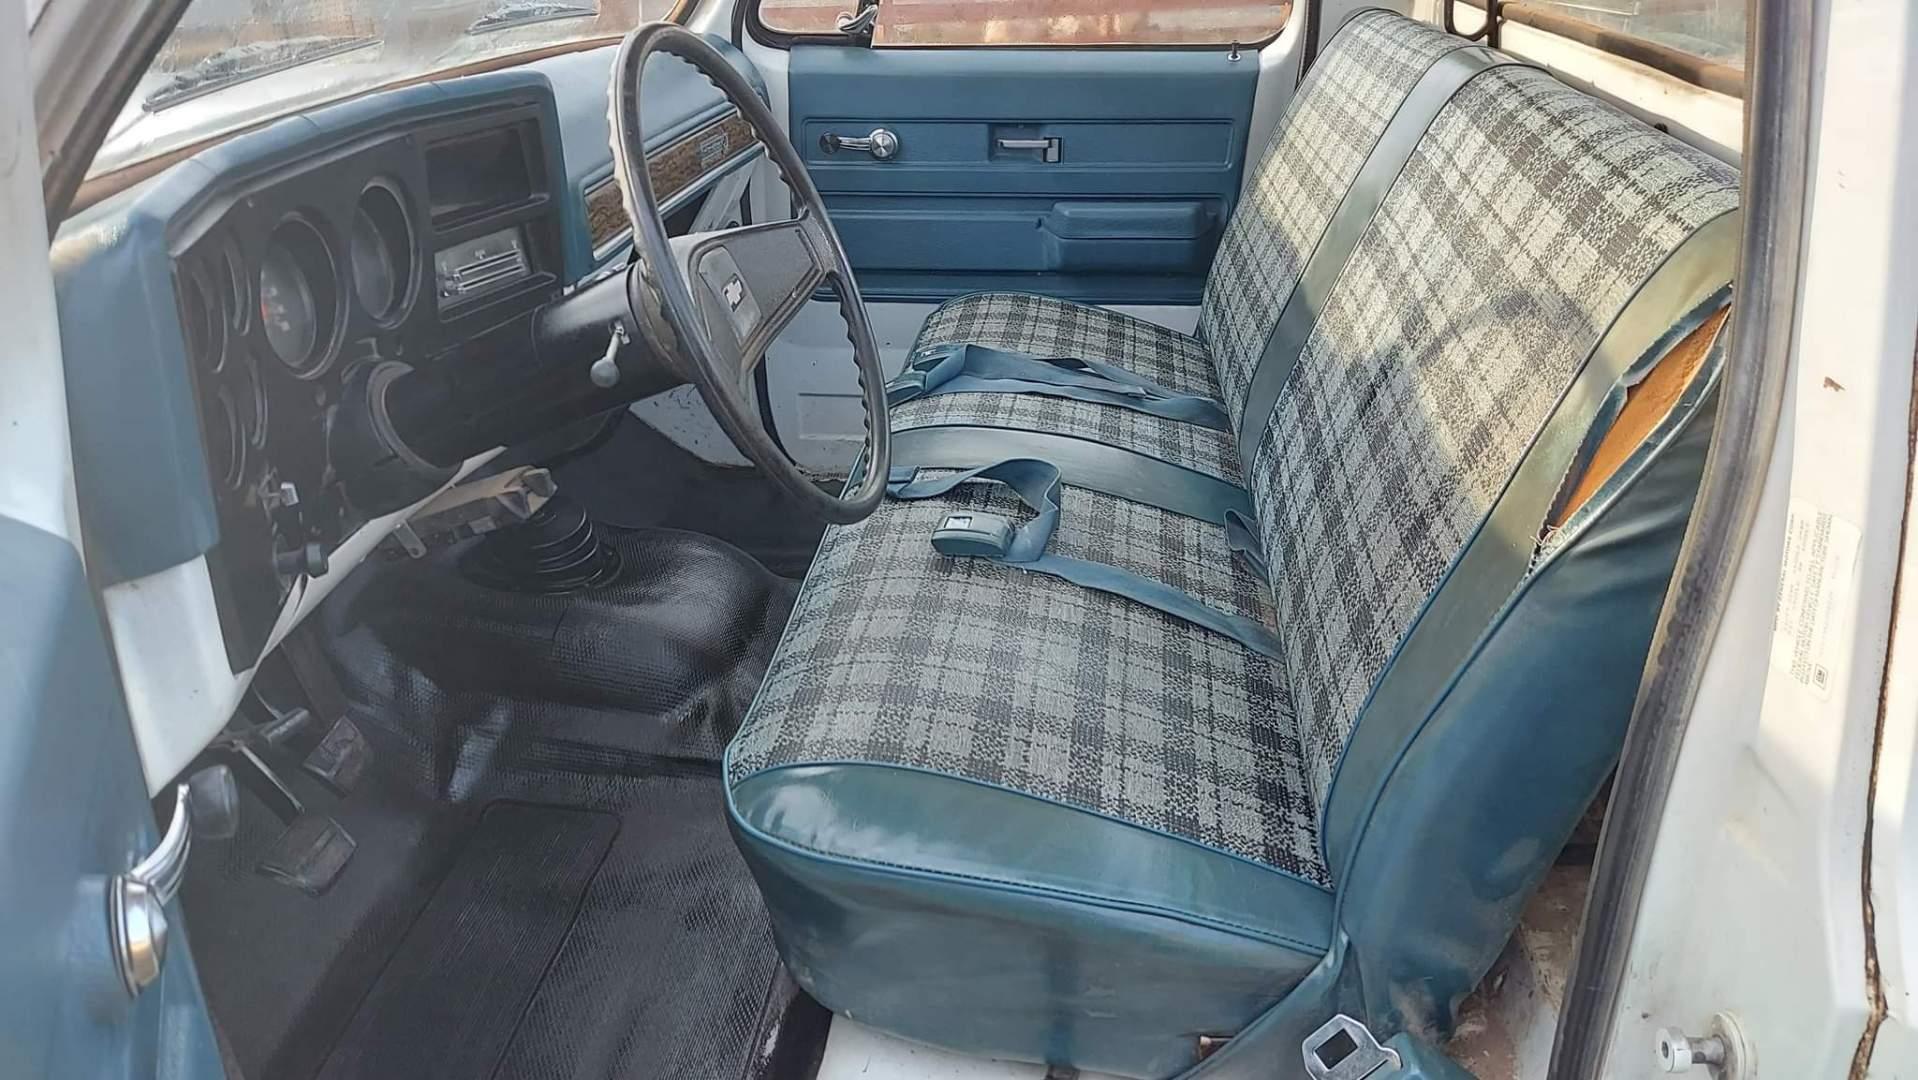 1976-Chevrolet-C20-Custom-Deluxe-350ci-V8-22